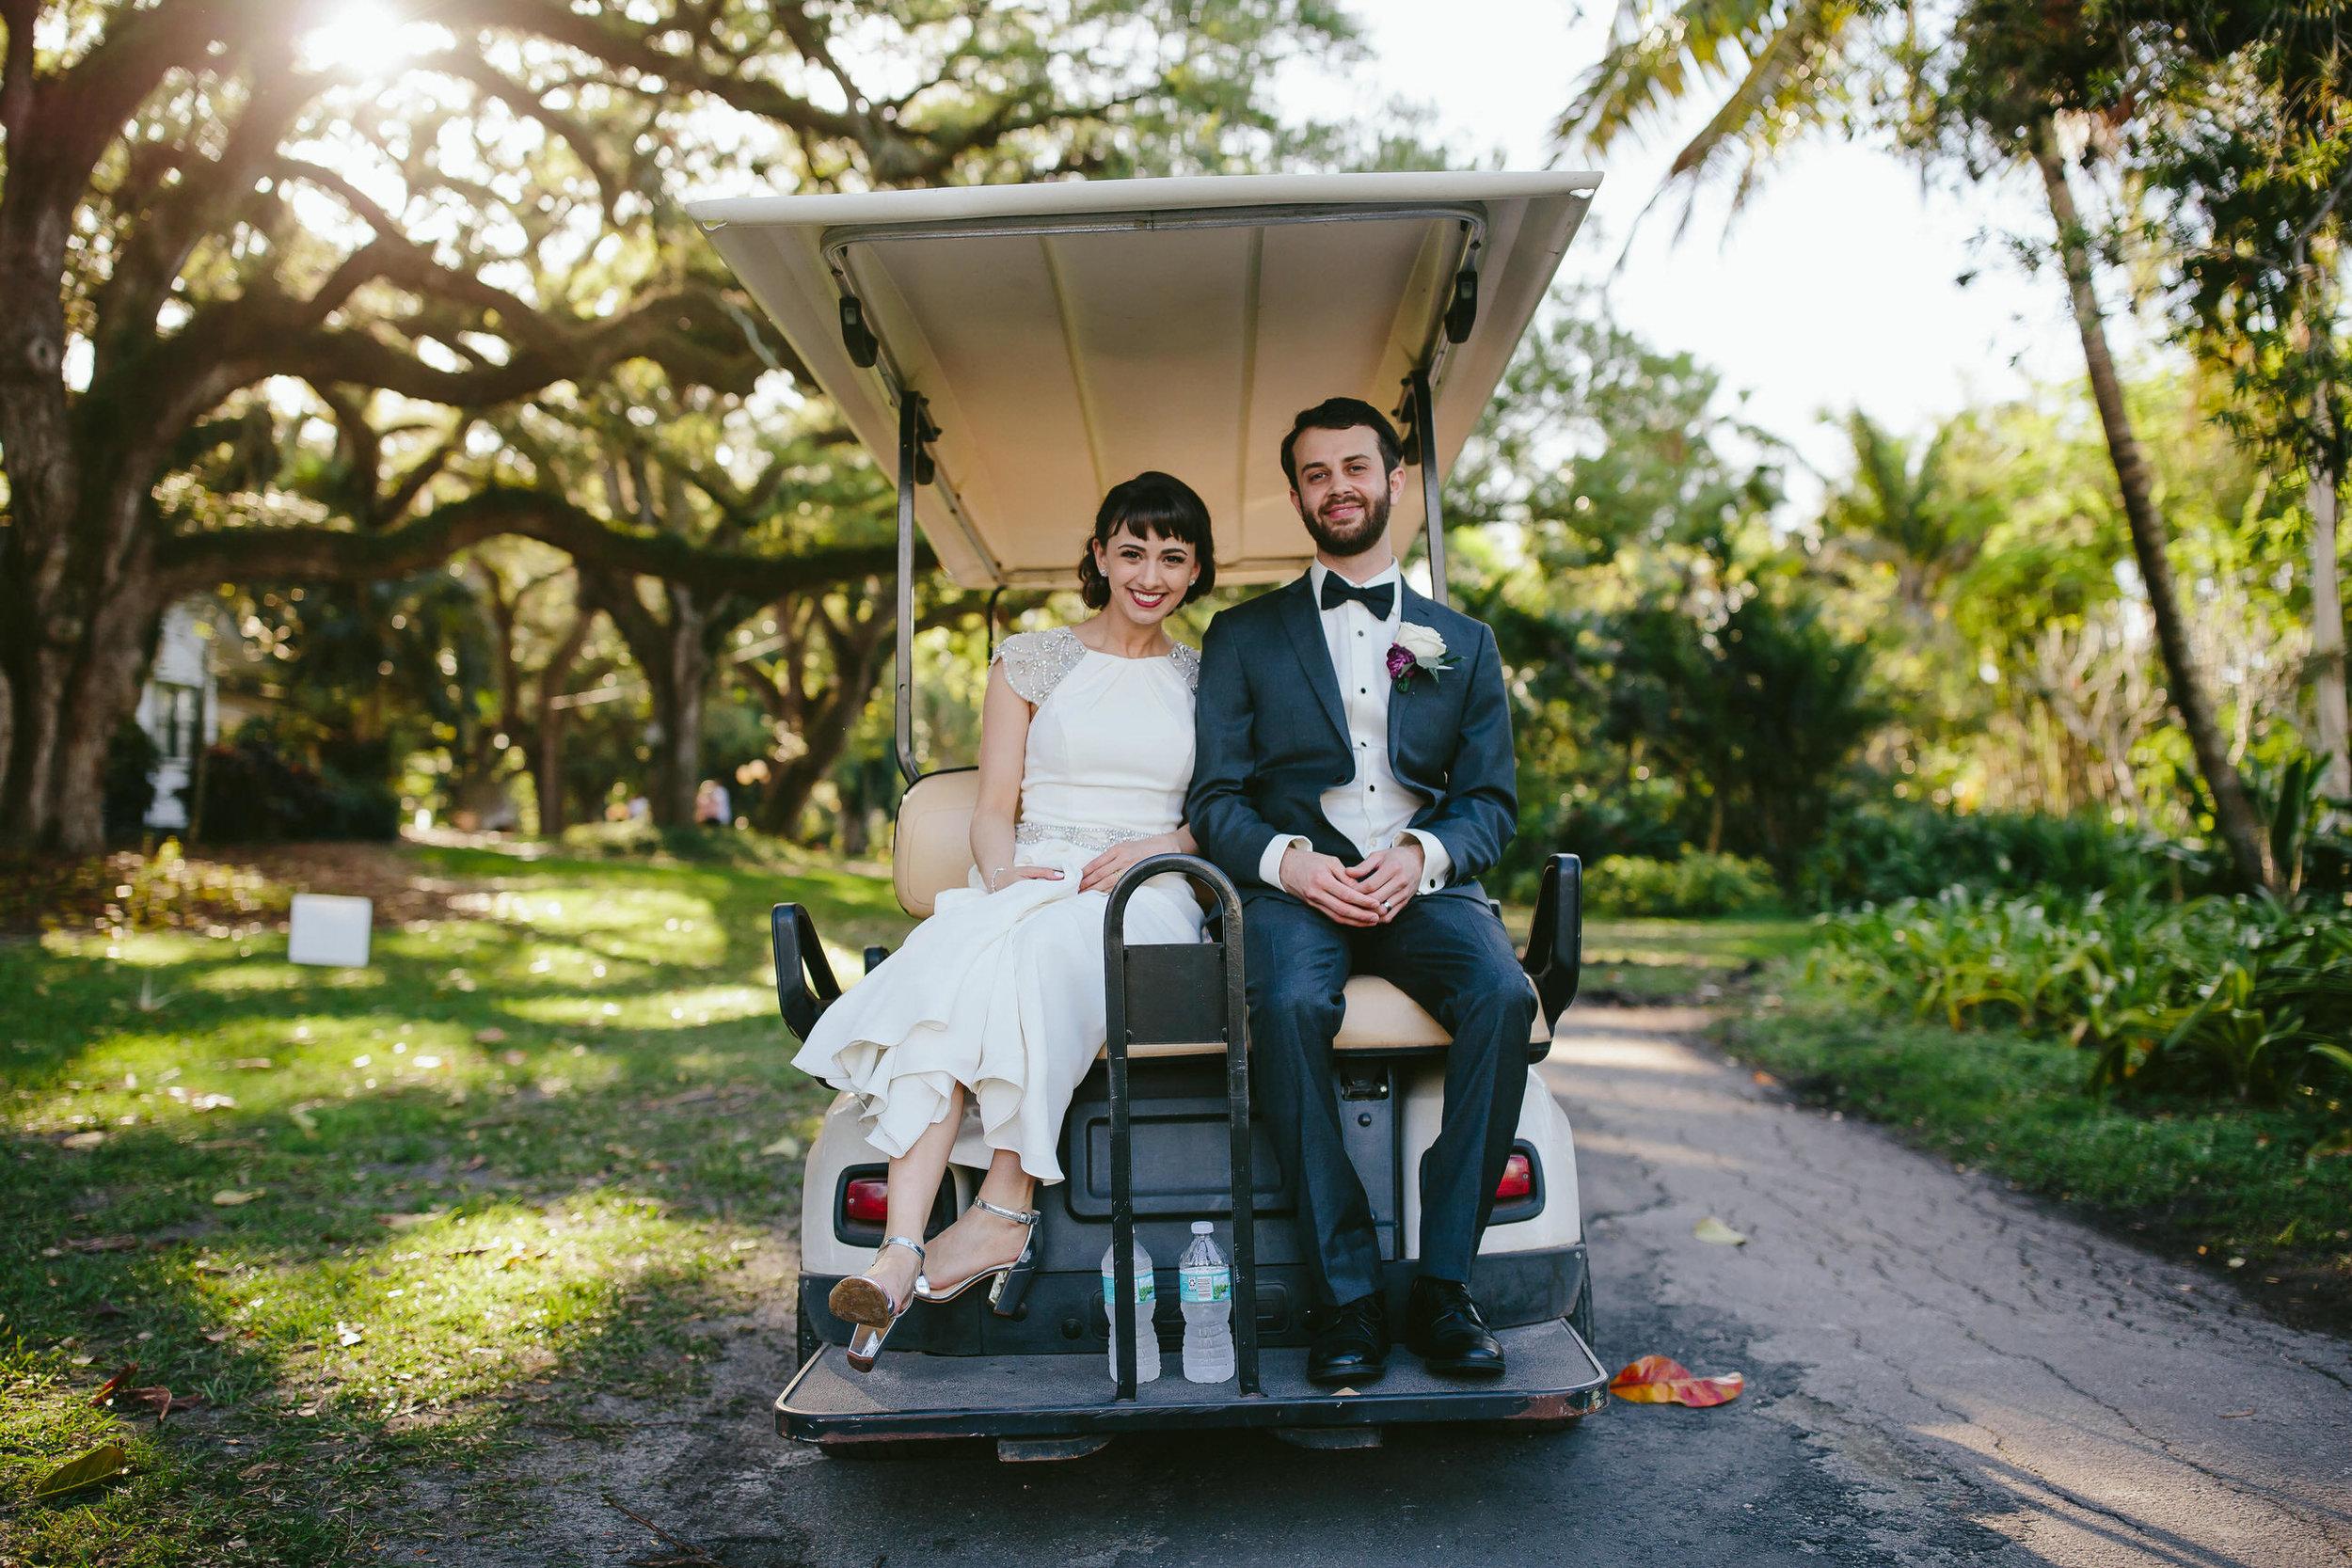 documentary wedding photographer south florida golf cart